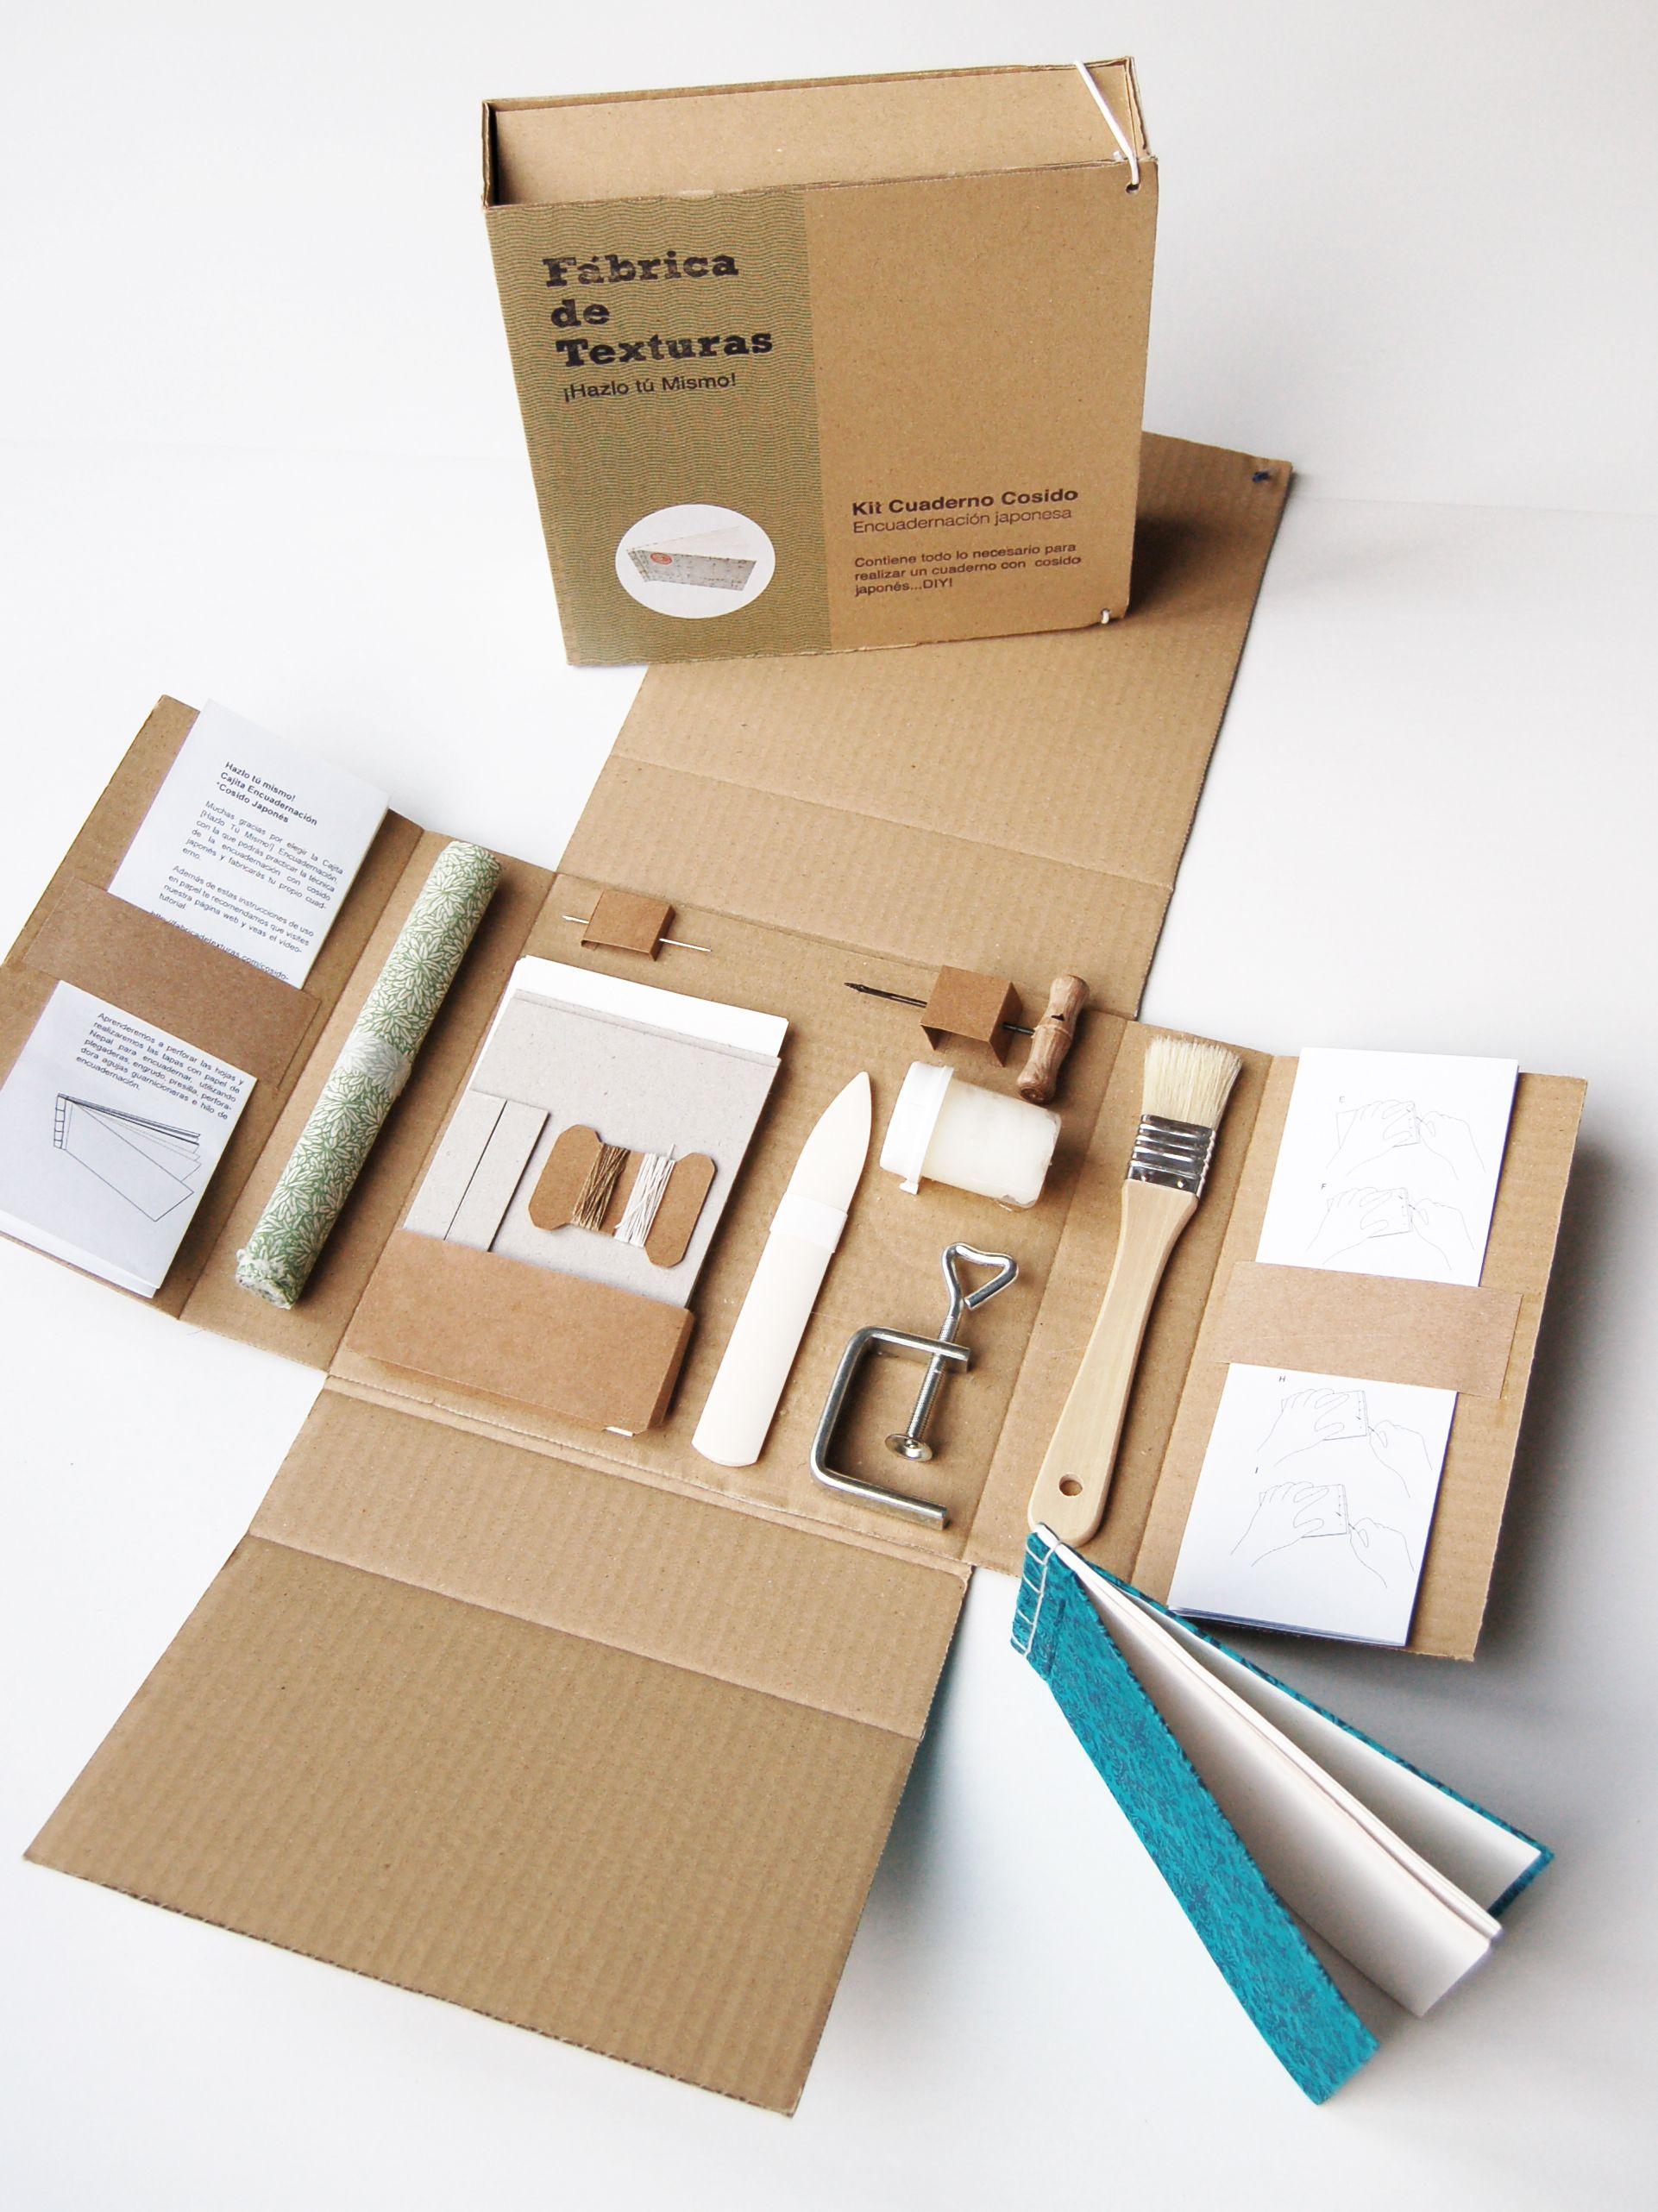 Encuadernacin japonesa bookbinding japanese and bookbinding japanese bookbinding kit httpfabricadetexturasgcartelproduct solutioingenieria Choice Image